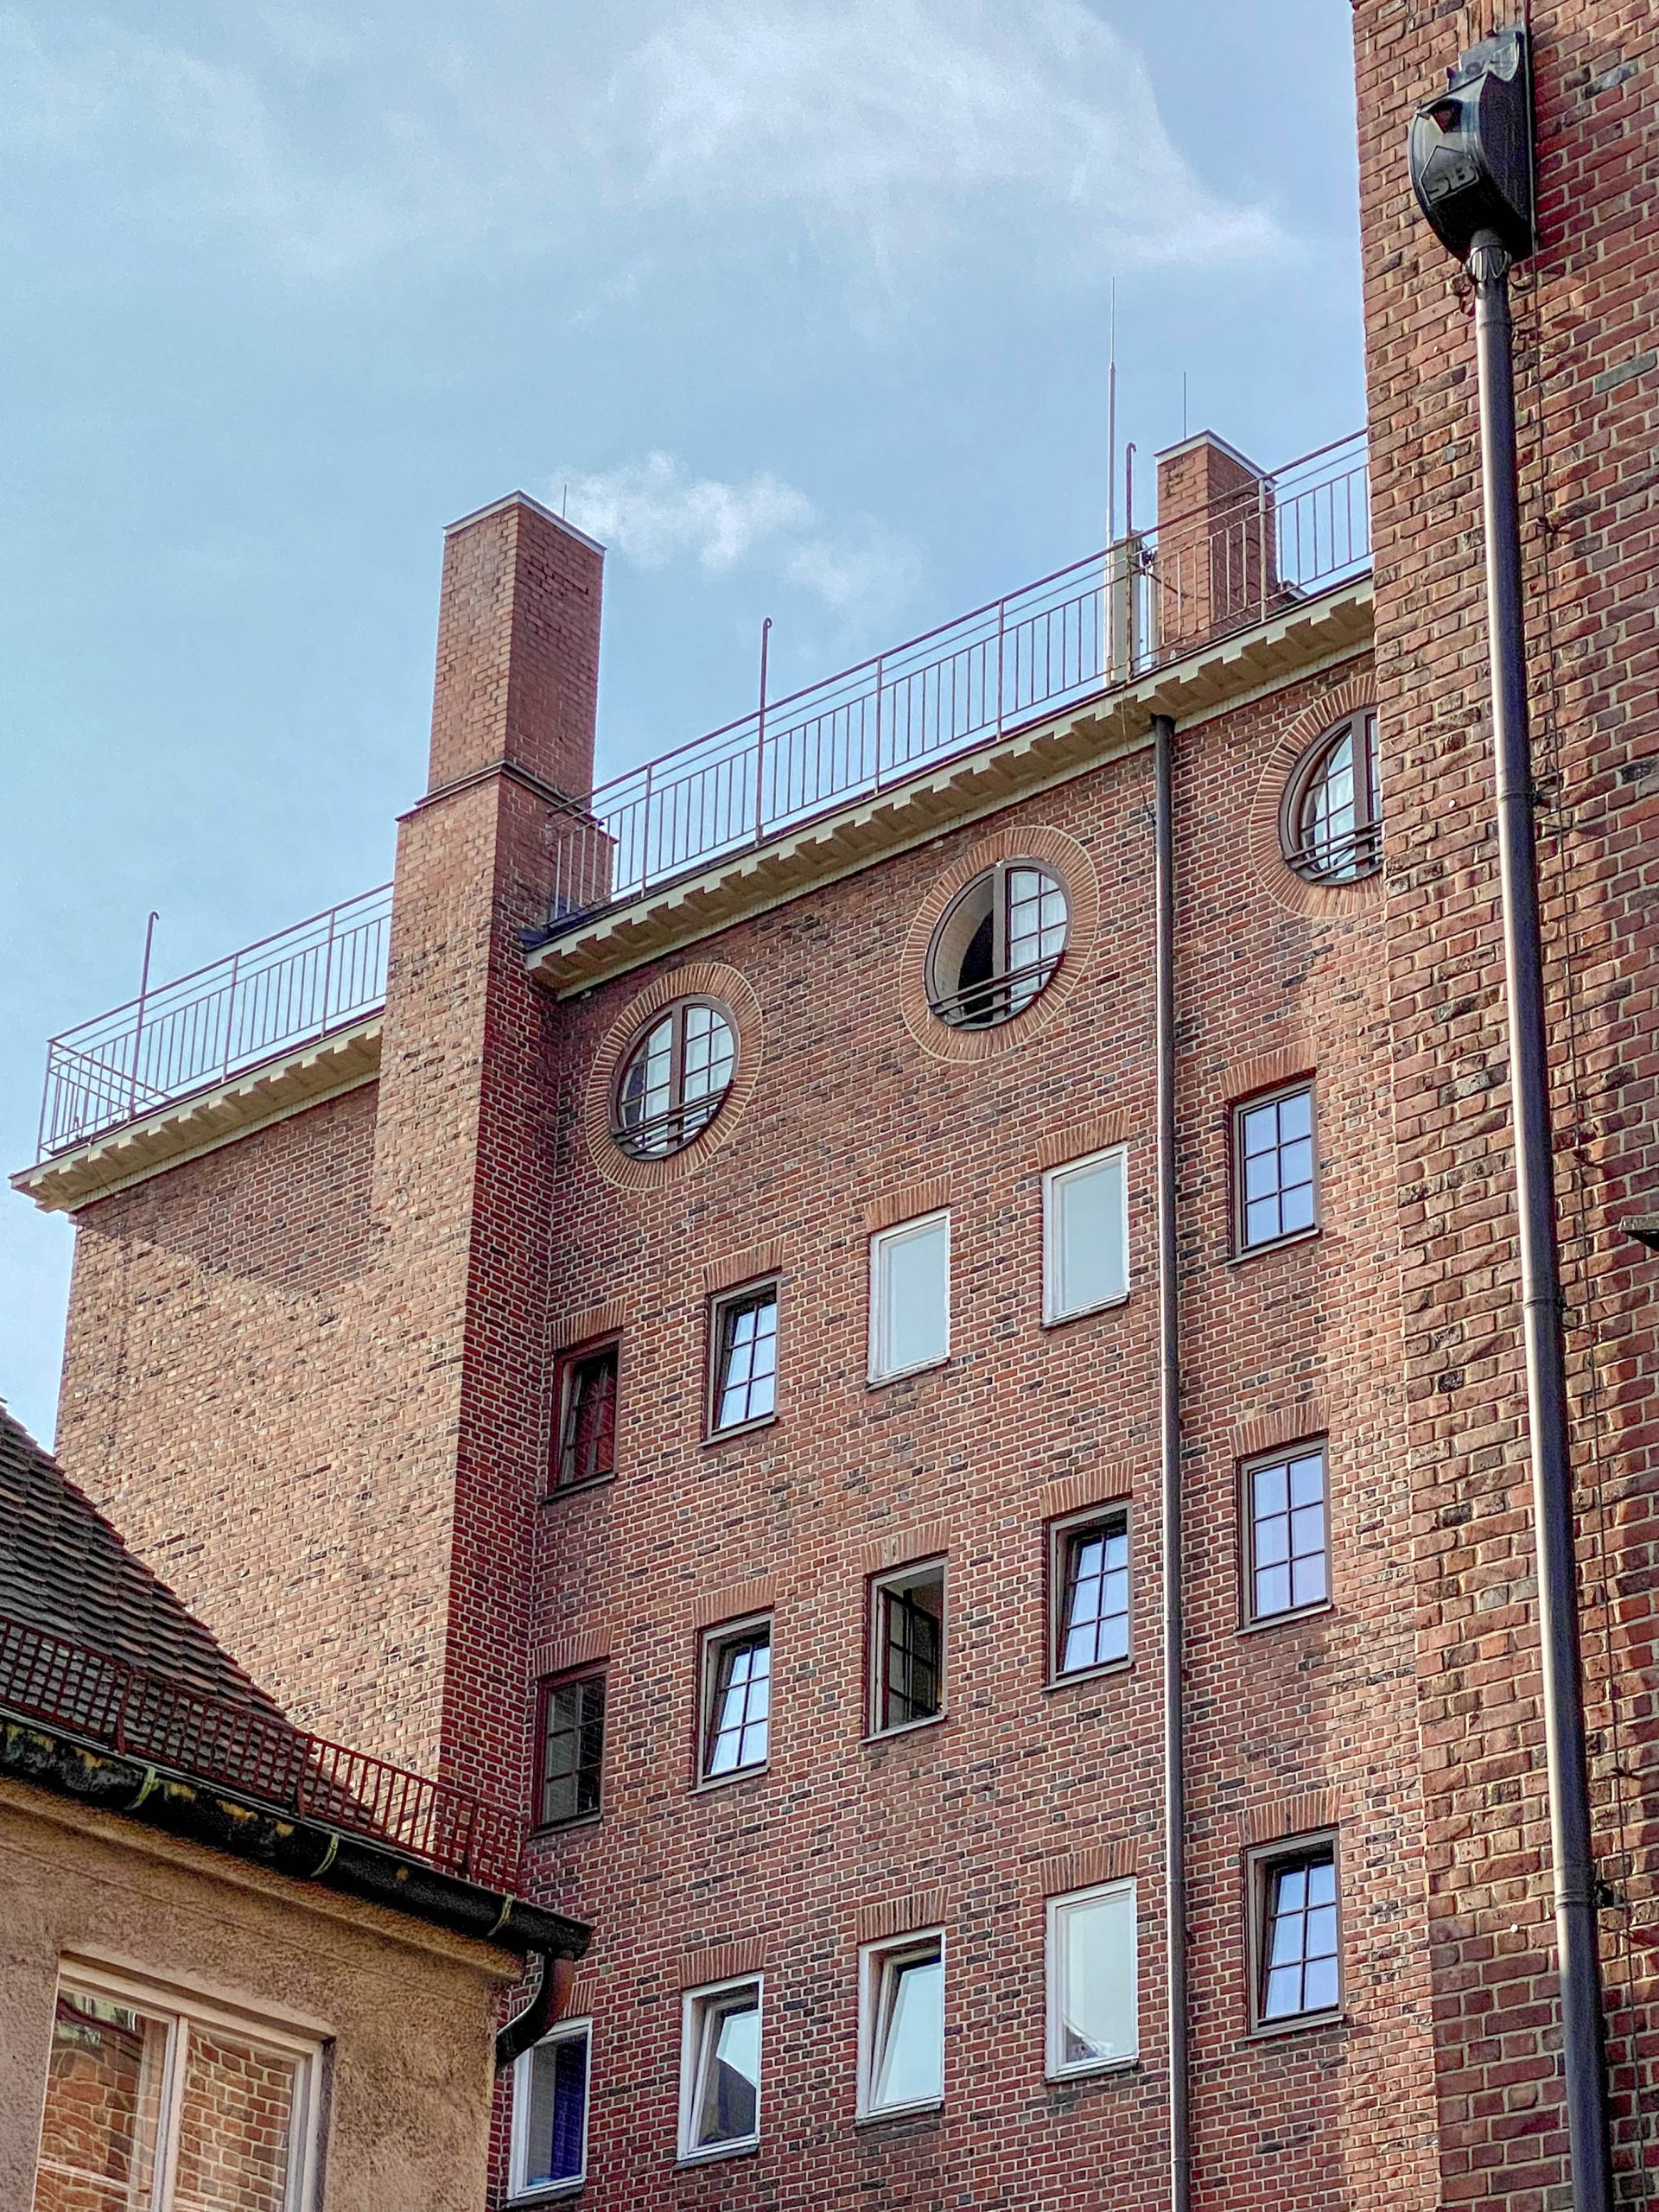 Ledigenheim, 1925-1927. Architect: Theodor Fischer